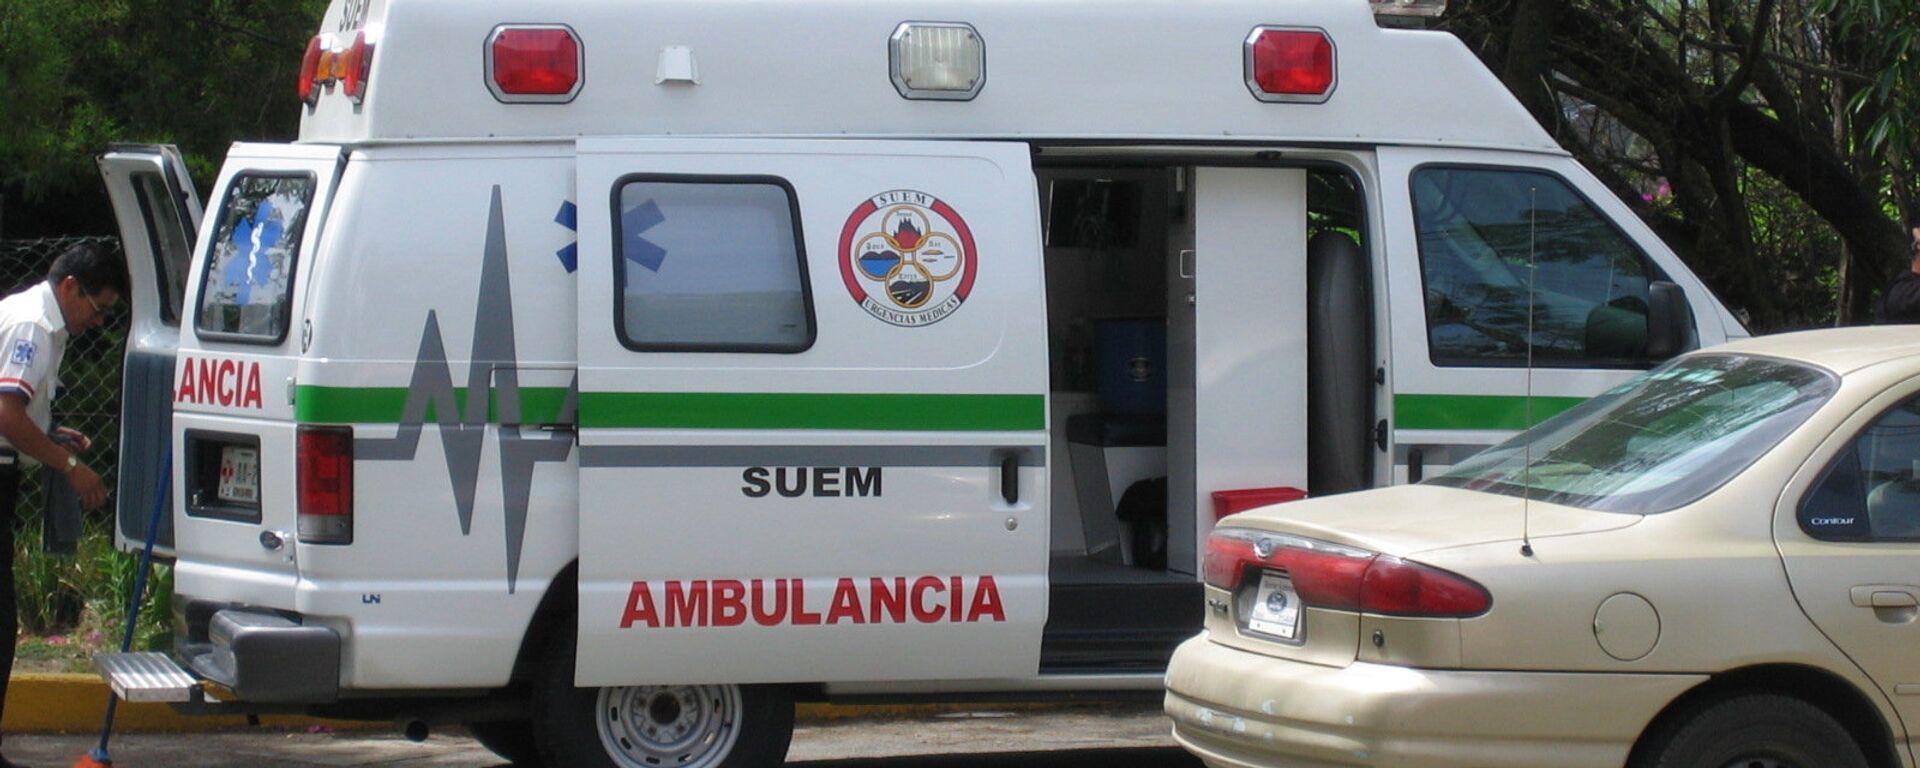 Ambulancia mexicana (archivo) - Sputnik Mundo, 1920, 04.06.2021